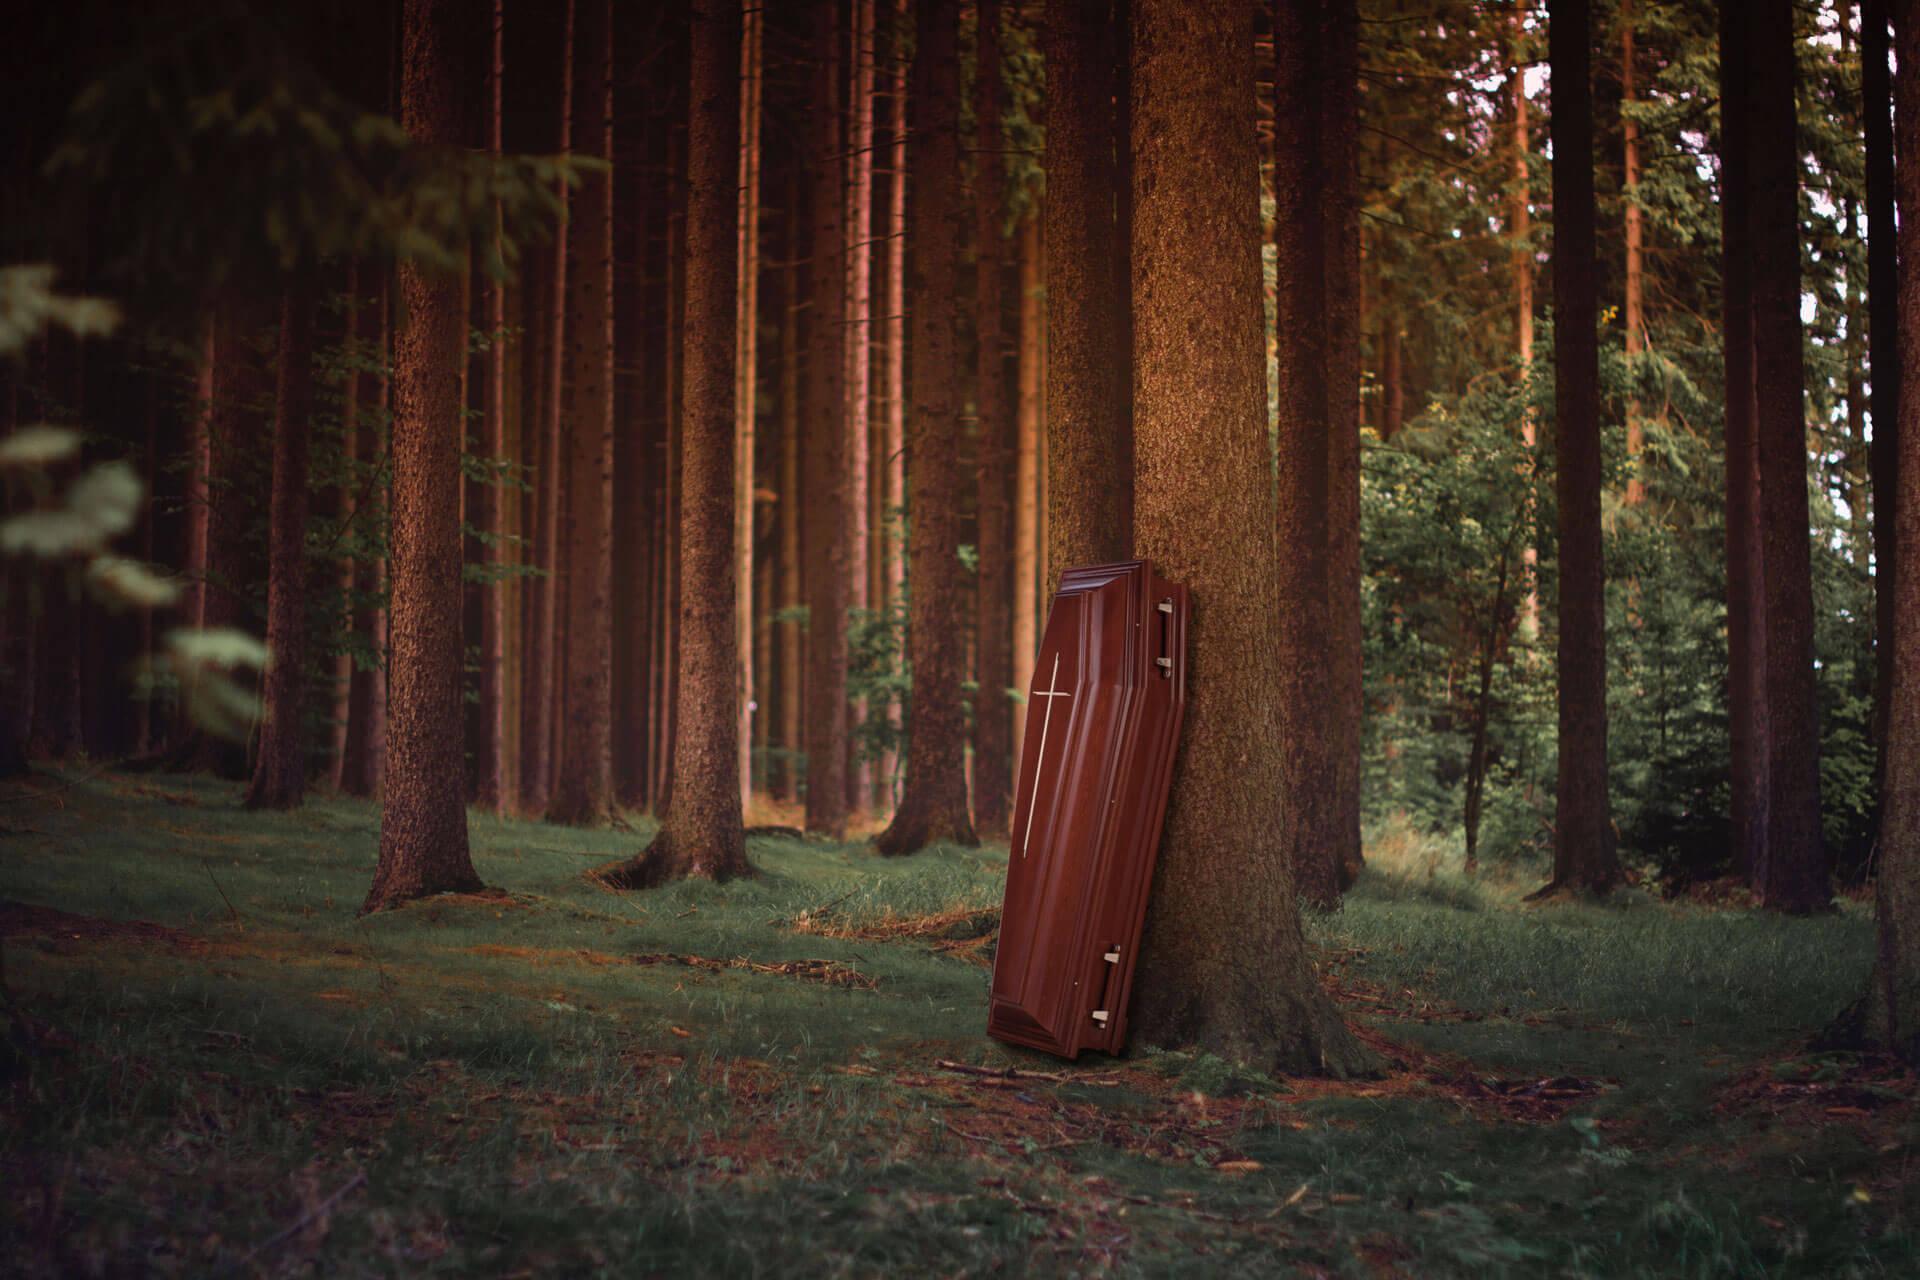 Imagebild Sarg im Wald